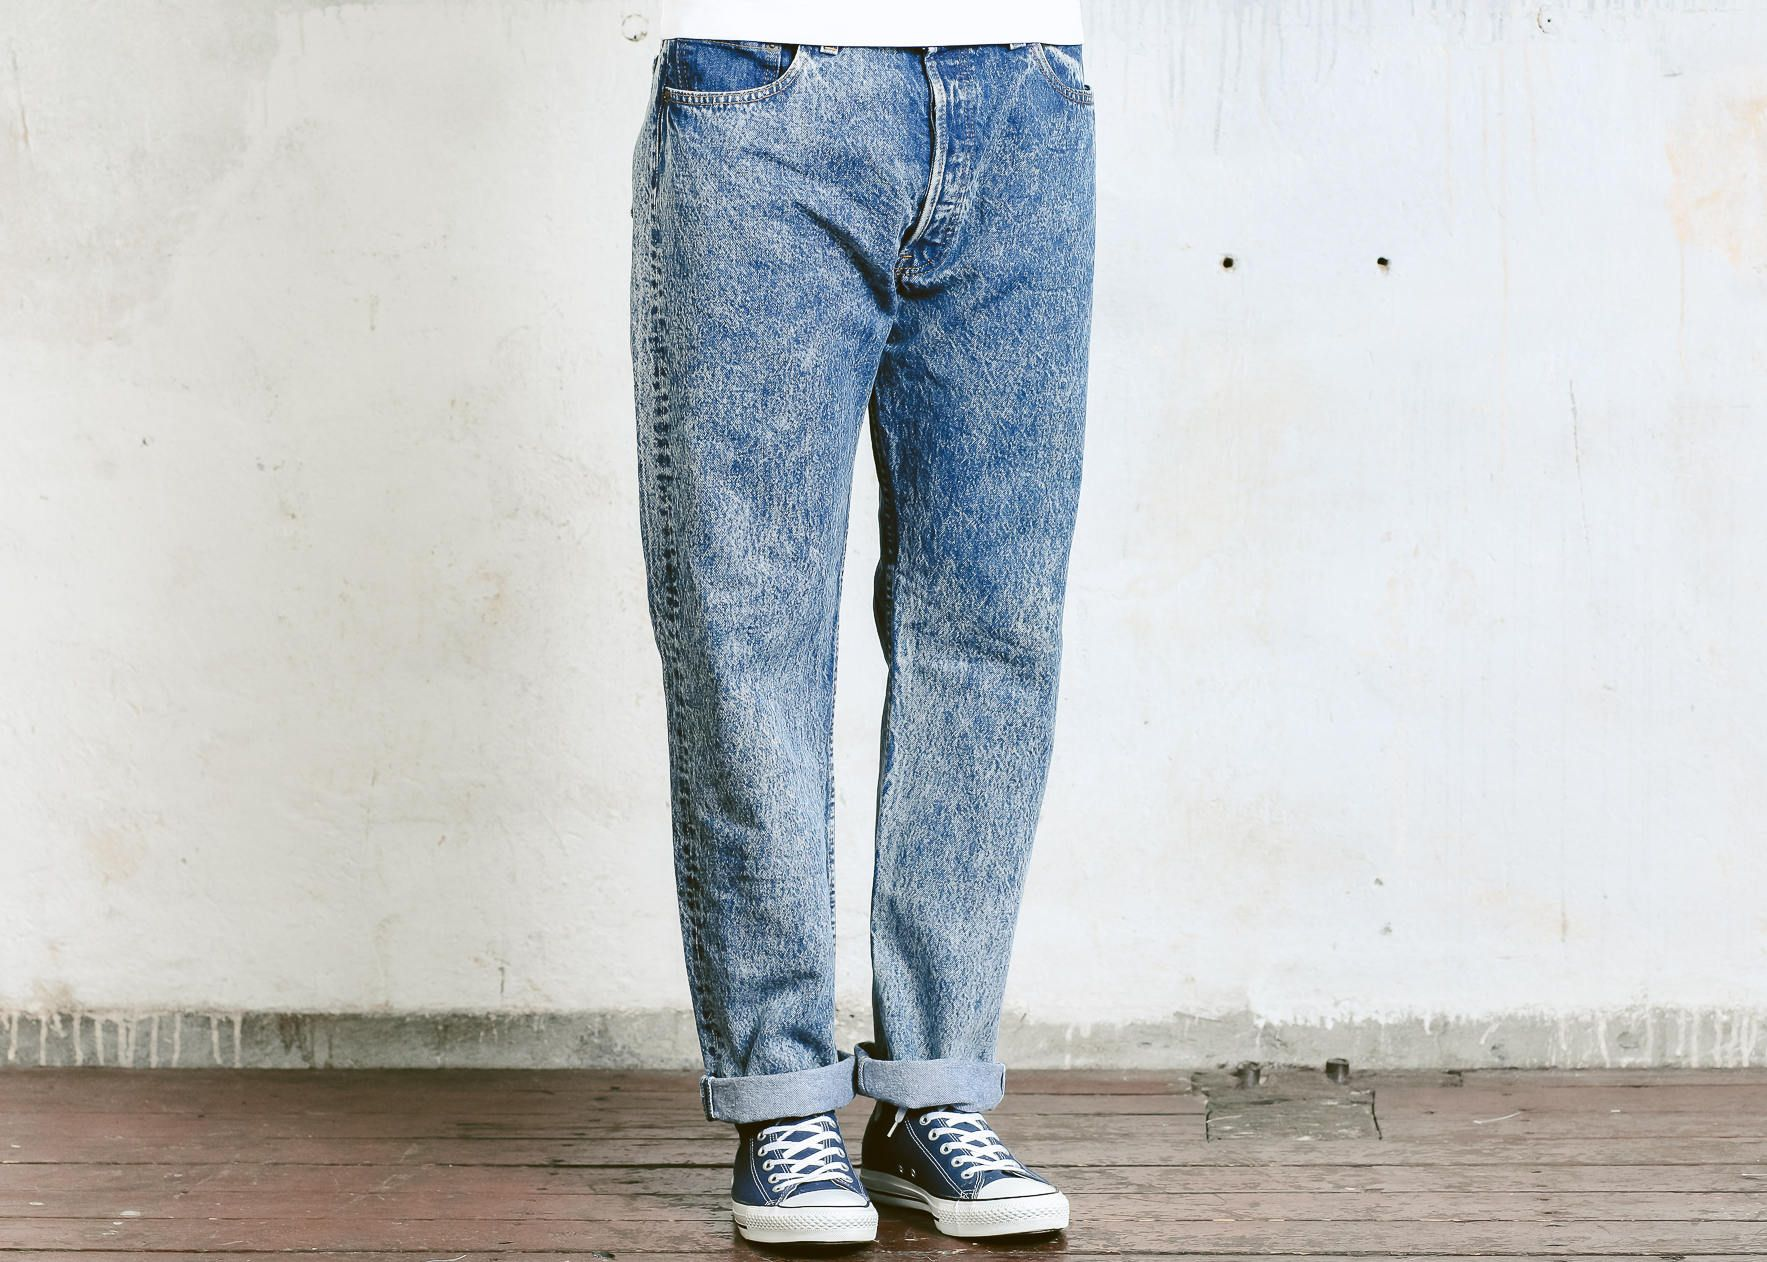 2d570669 Acid Wash Levis Jeans . Vintage 90s Hipster Jeans Boyfriend Gift Tapered 90s  Jeans Men High Waist Jeans Unisex Denim Jeans . size W36 L30